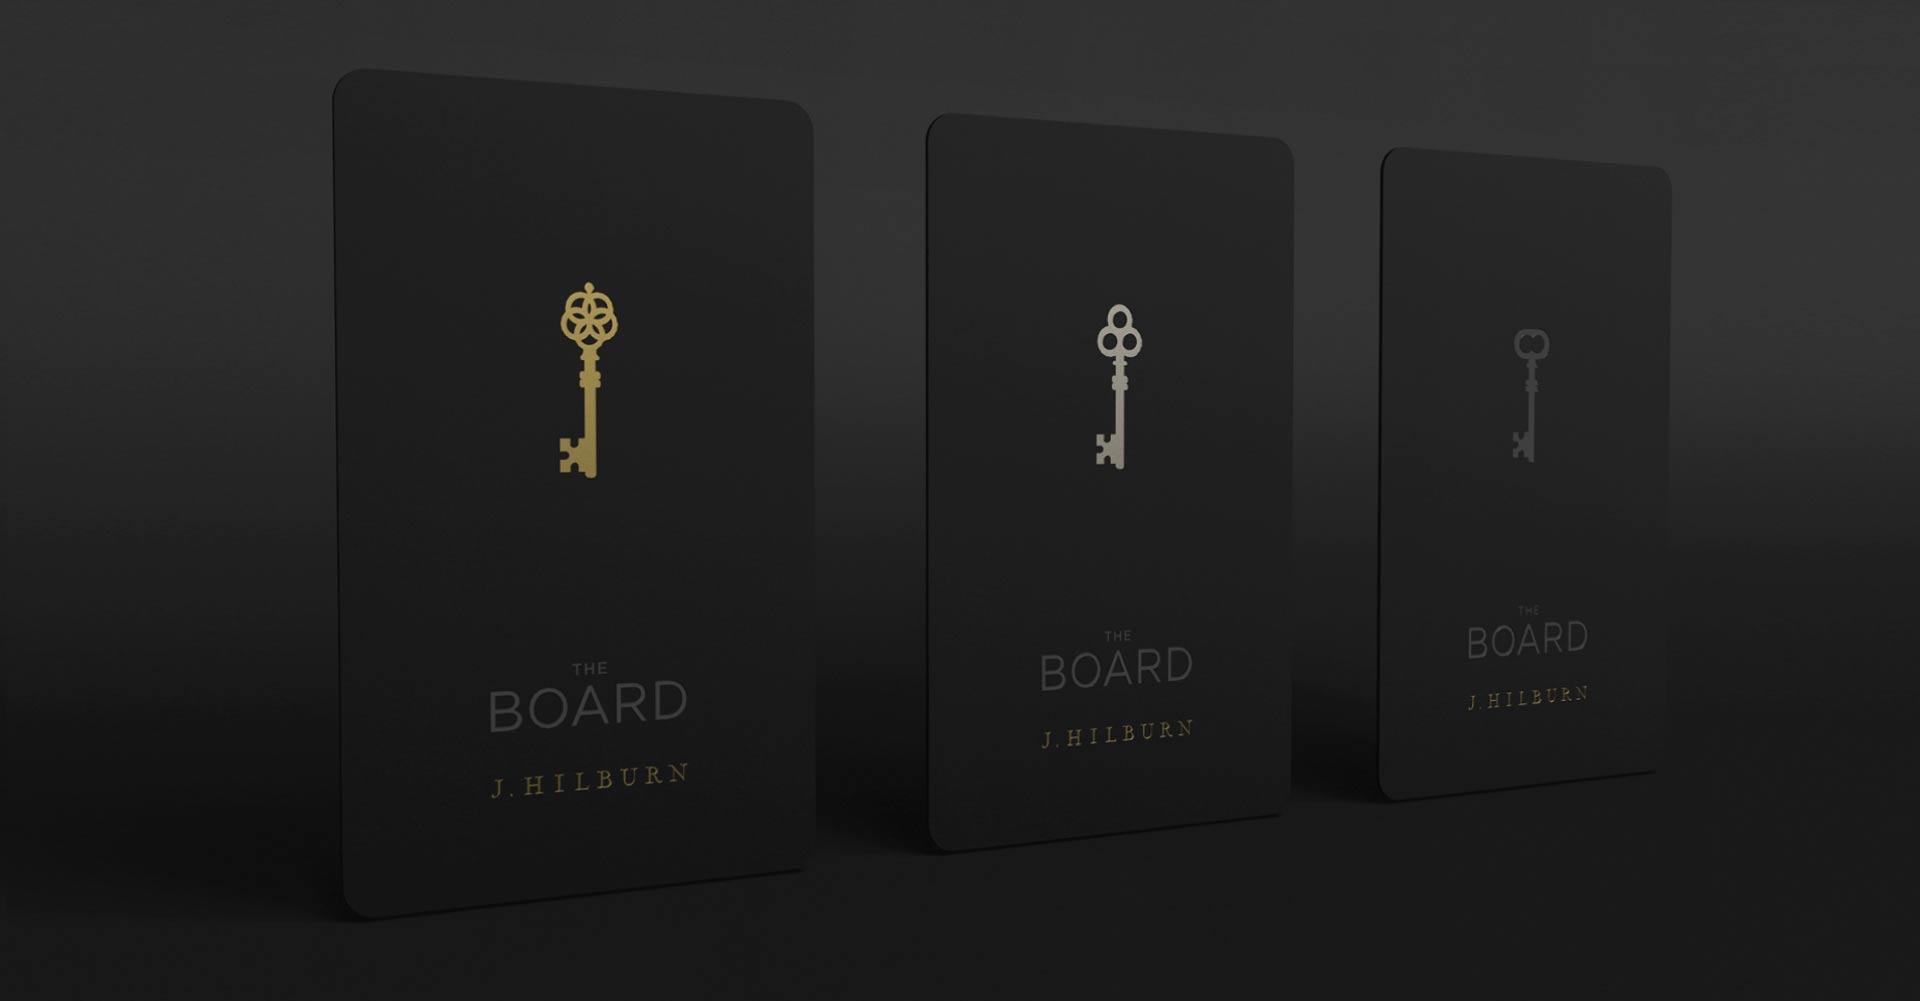 Creative_Retail_Packaging_Branding_Identity_Web_Design_JHilburn_12.jpg